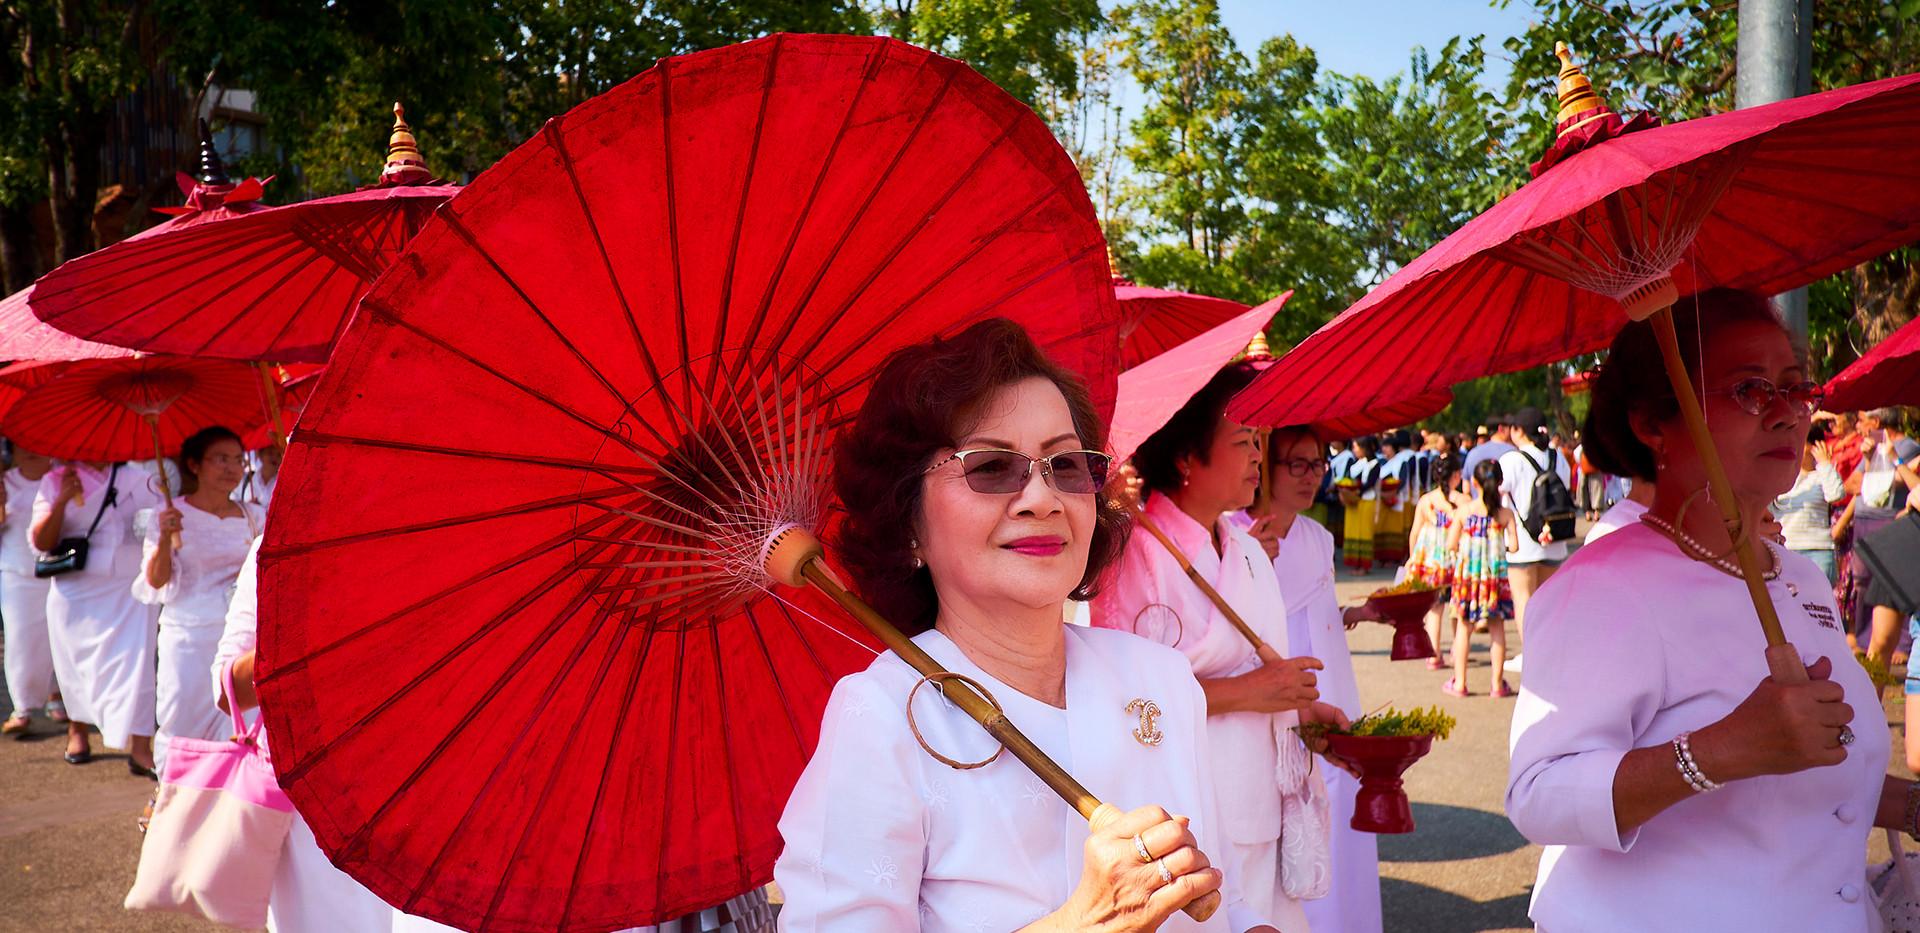 Copy of Thai_2017_18320_medium.jpg